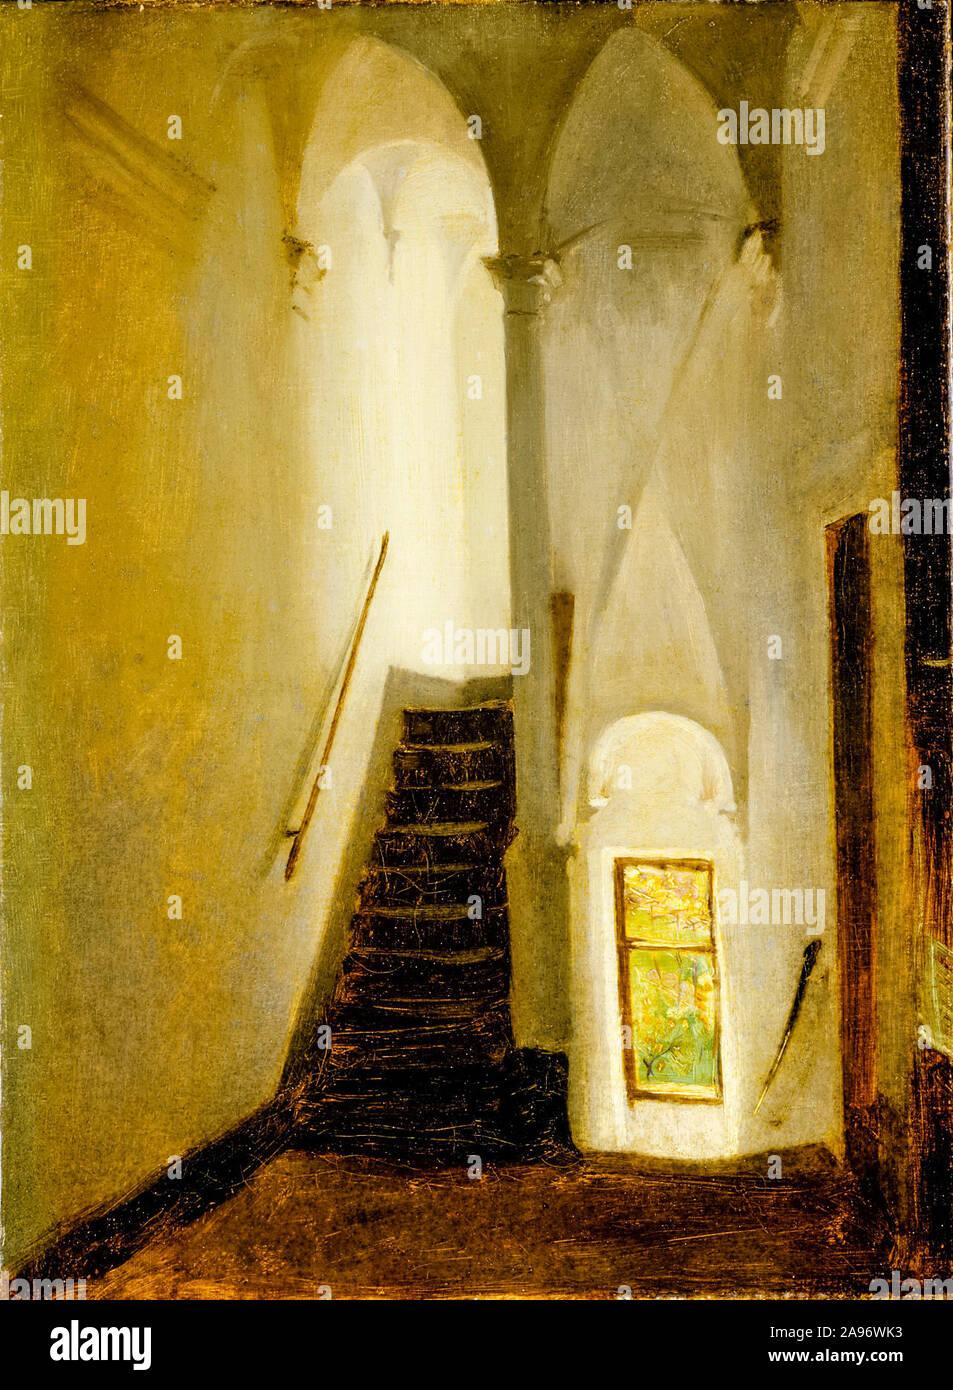 John Singer Sargent, Staircase, painting, circa 1878 Stock Photo